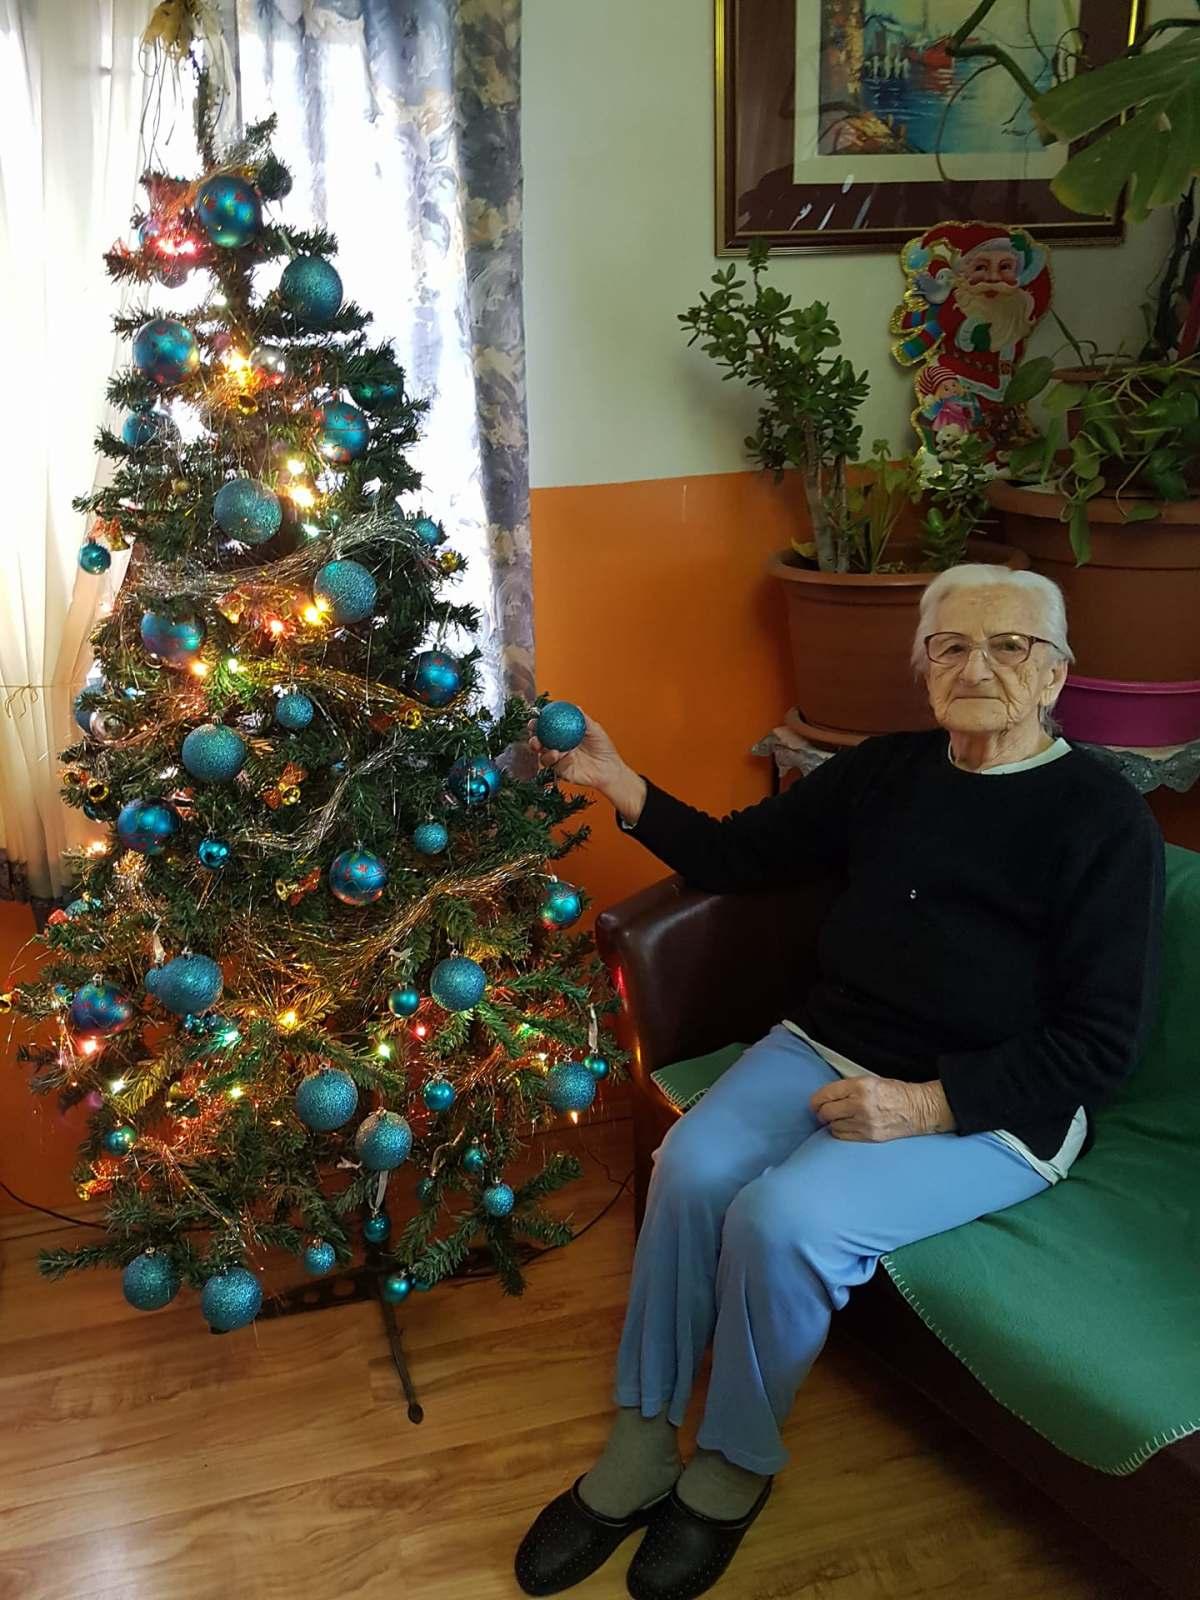 Božić u našem domu♥